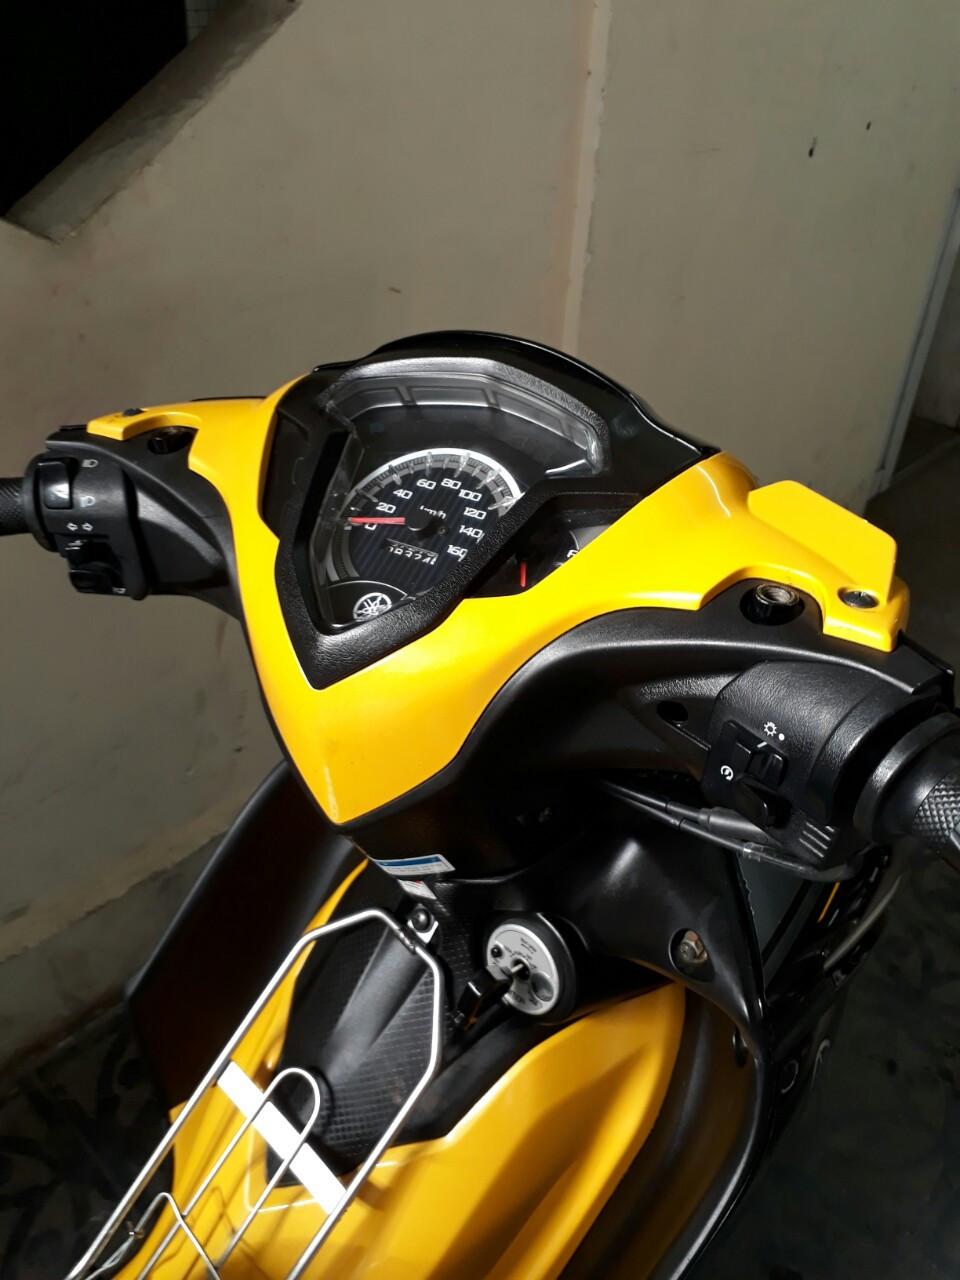 Yamaha Jupiter RC FI vanh duc mot chu di - 3